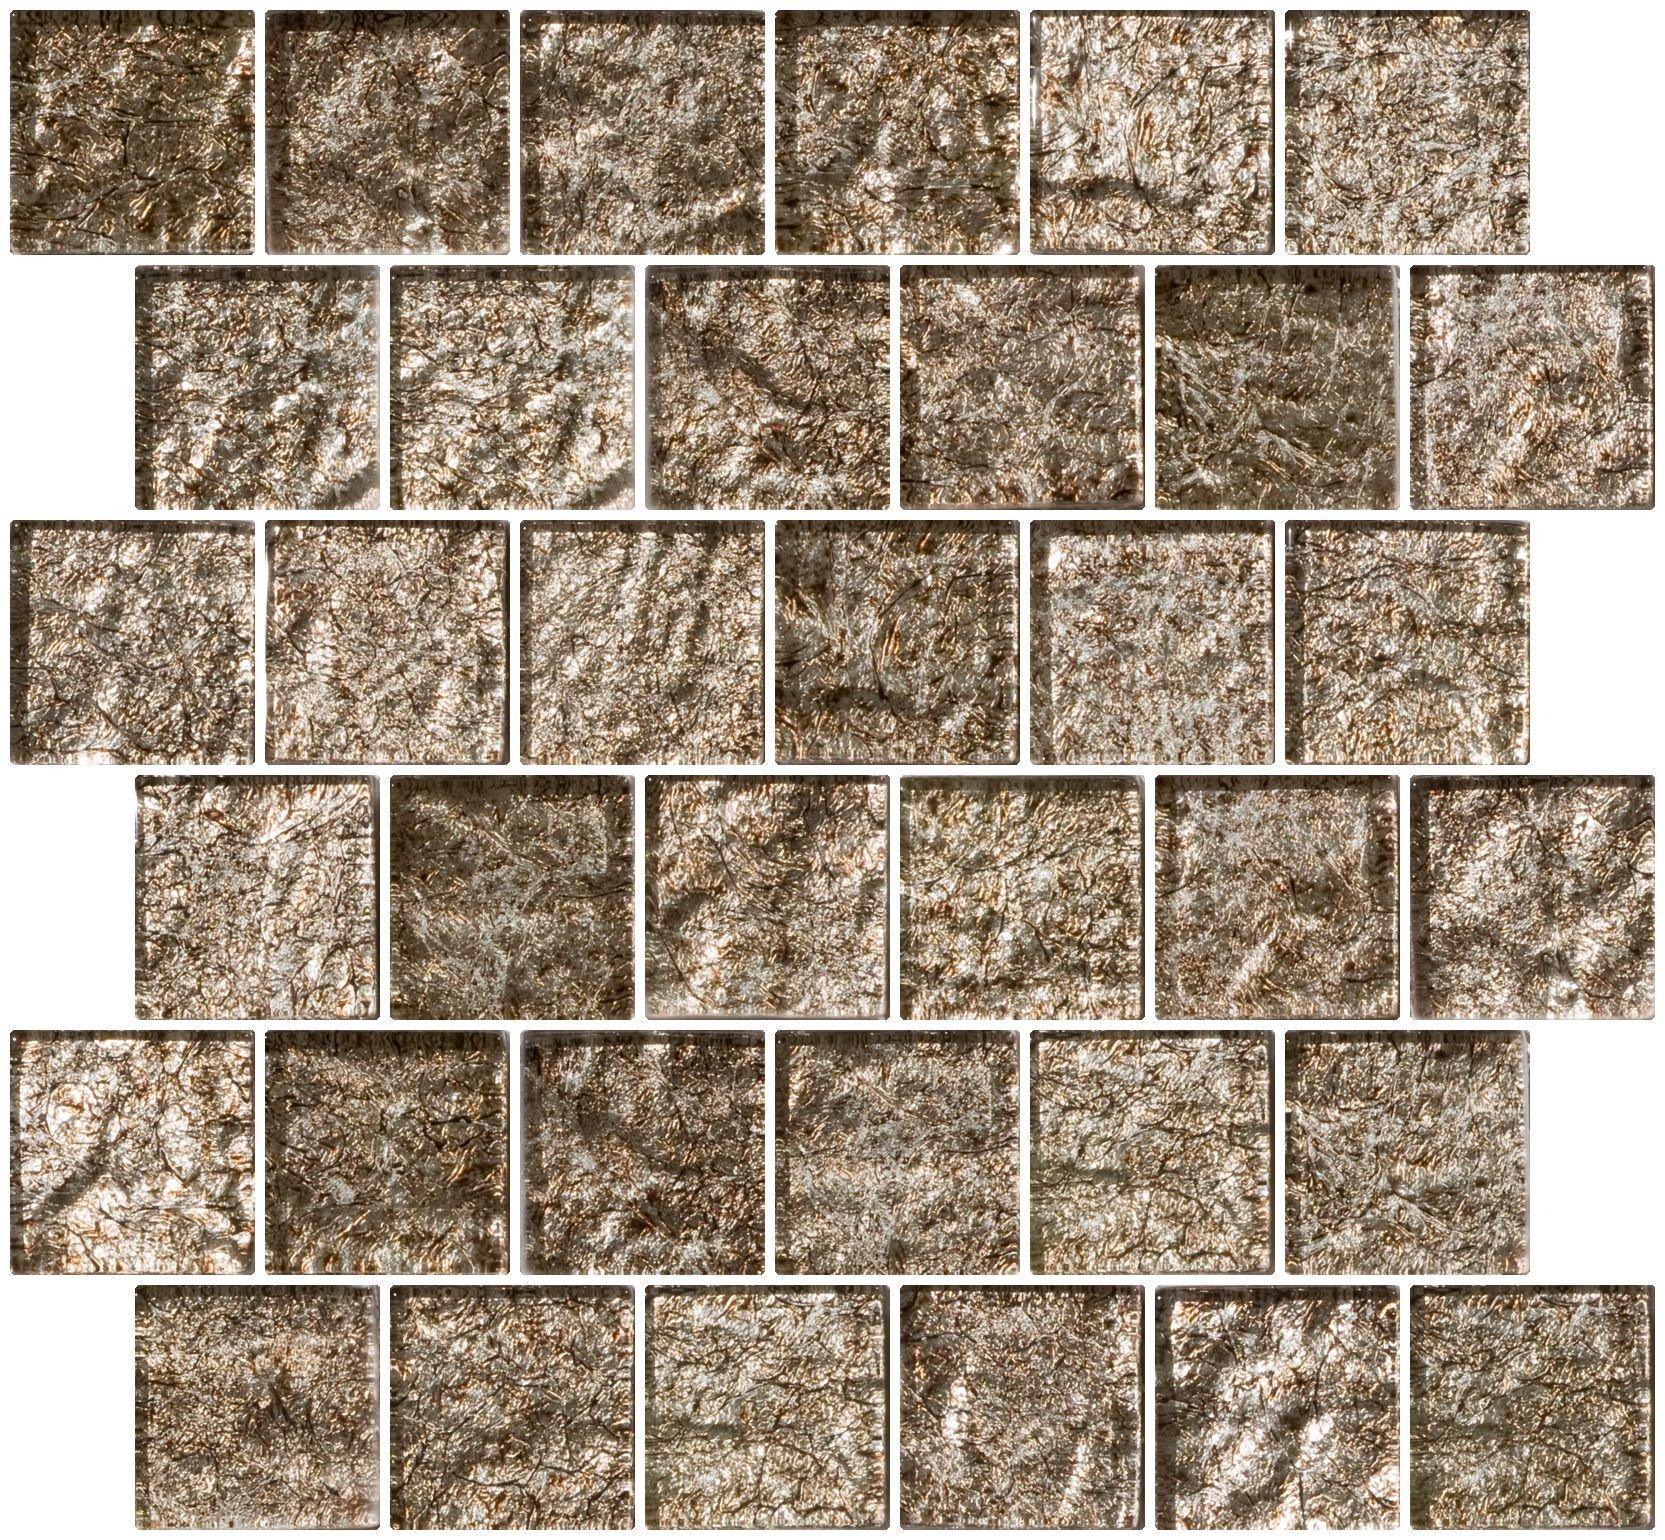 Susan Jablon Mosaics - 2x2 Inch Espresso Brown Satin Metallic Glass Tile Reset In Offset Layout